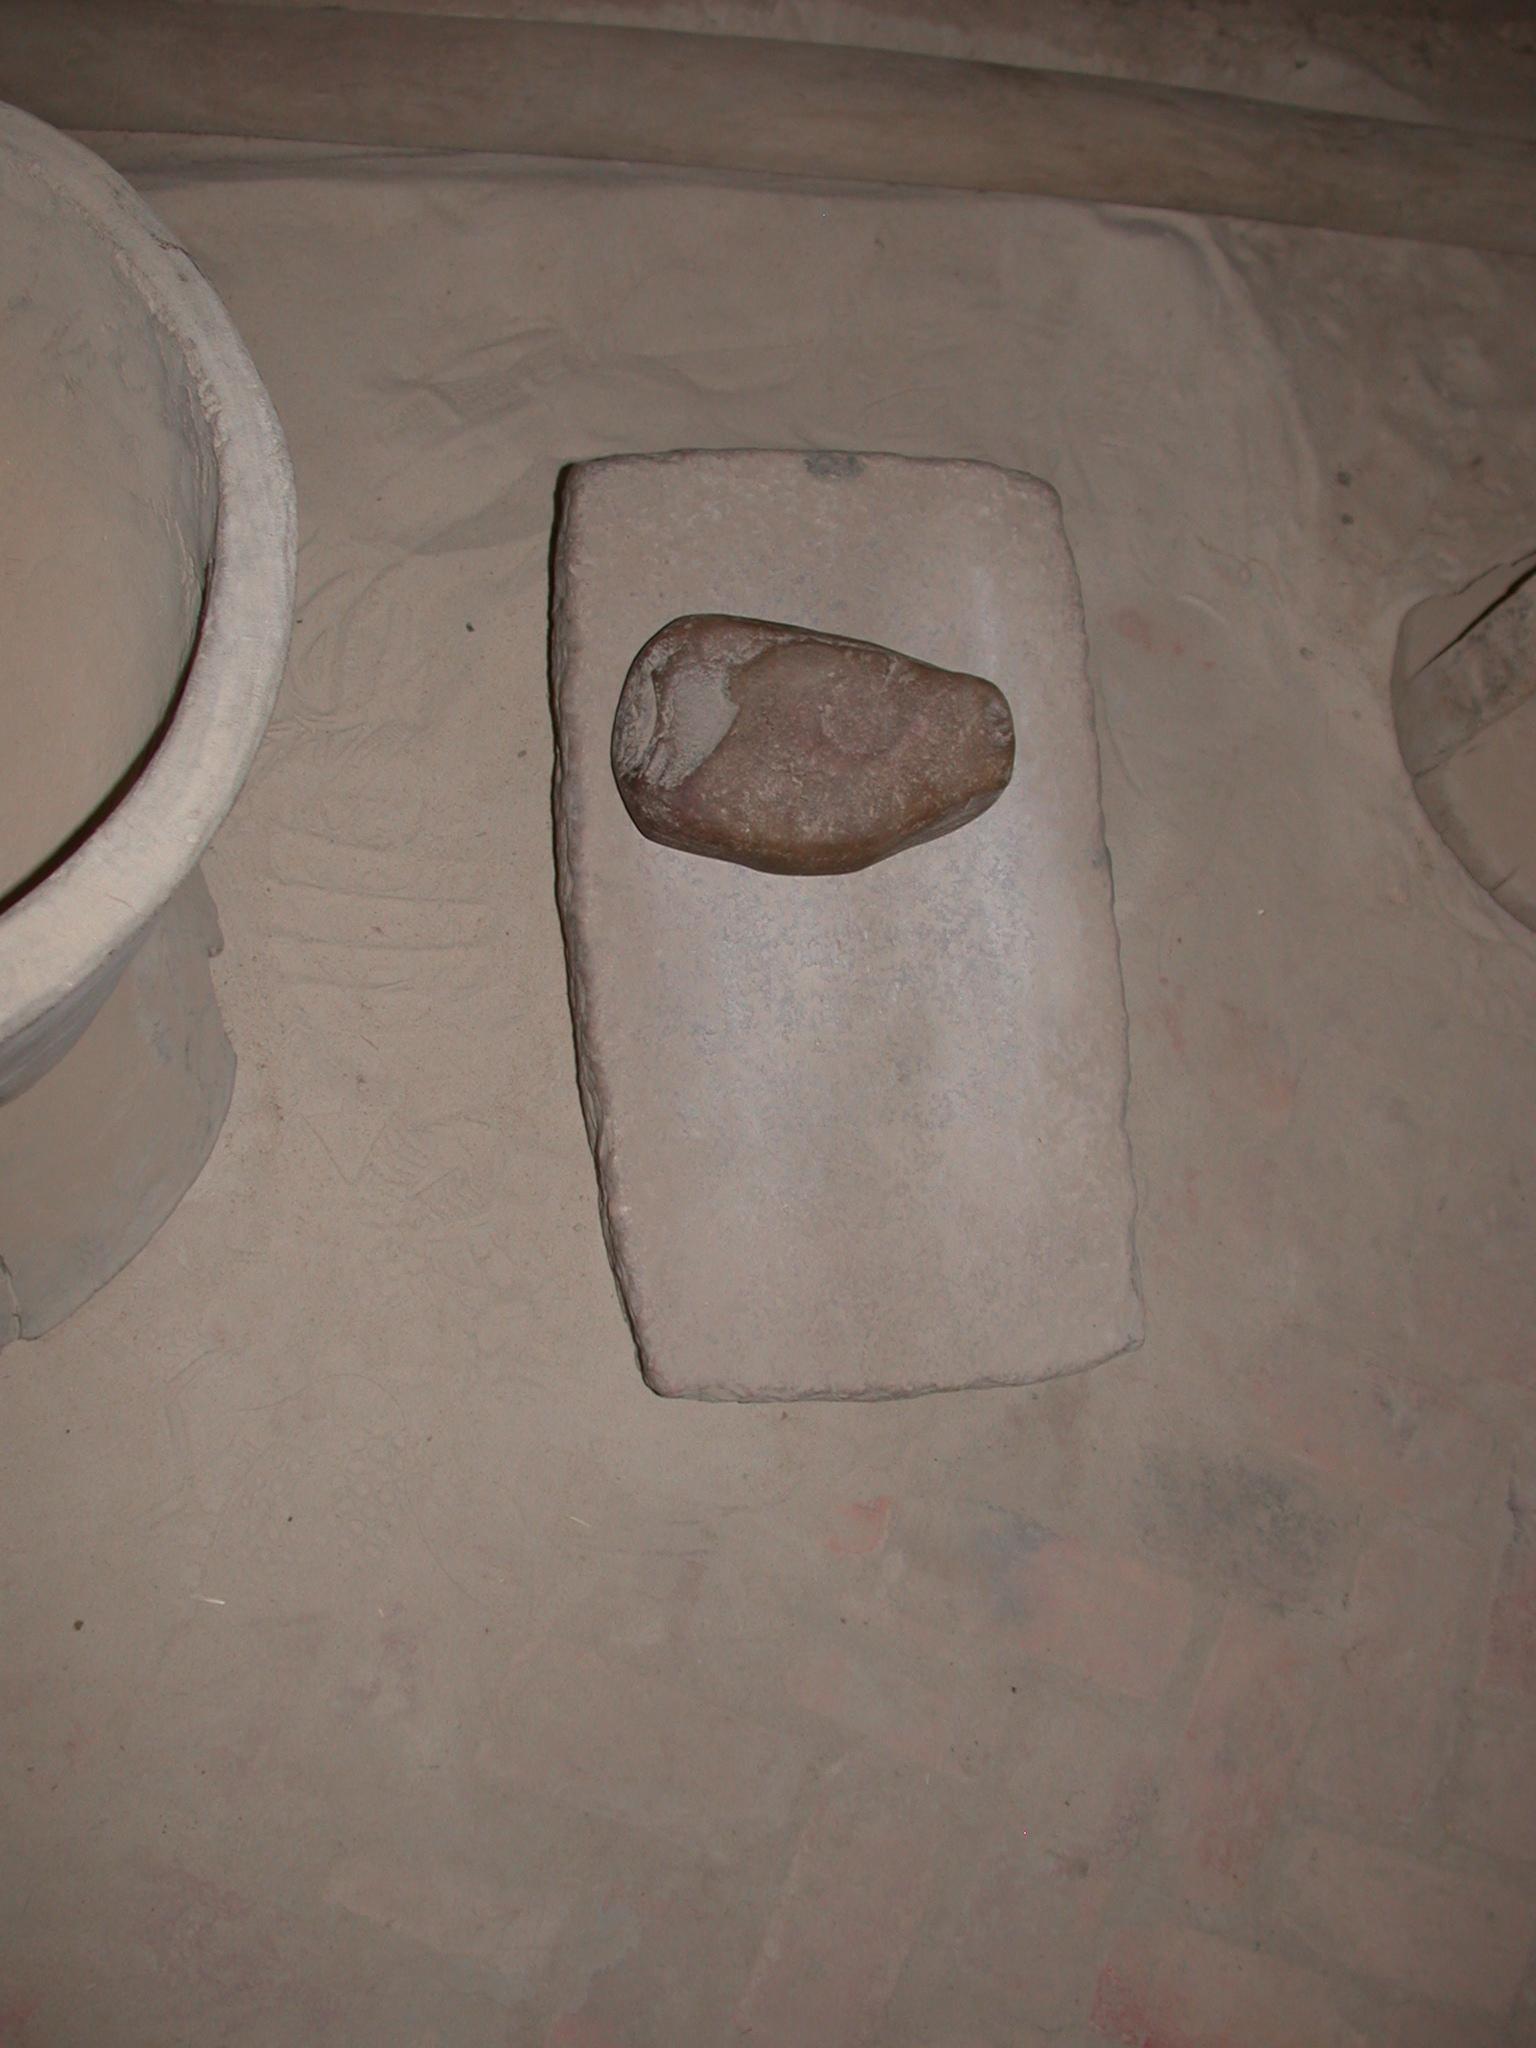 Grinding Stone, Timbuktu Ethnological Museum, Timbuktu, Mali